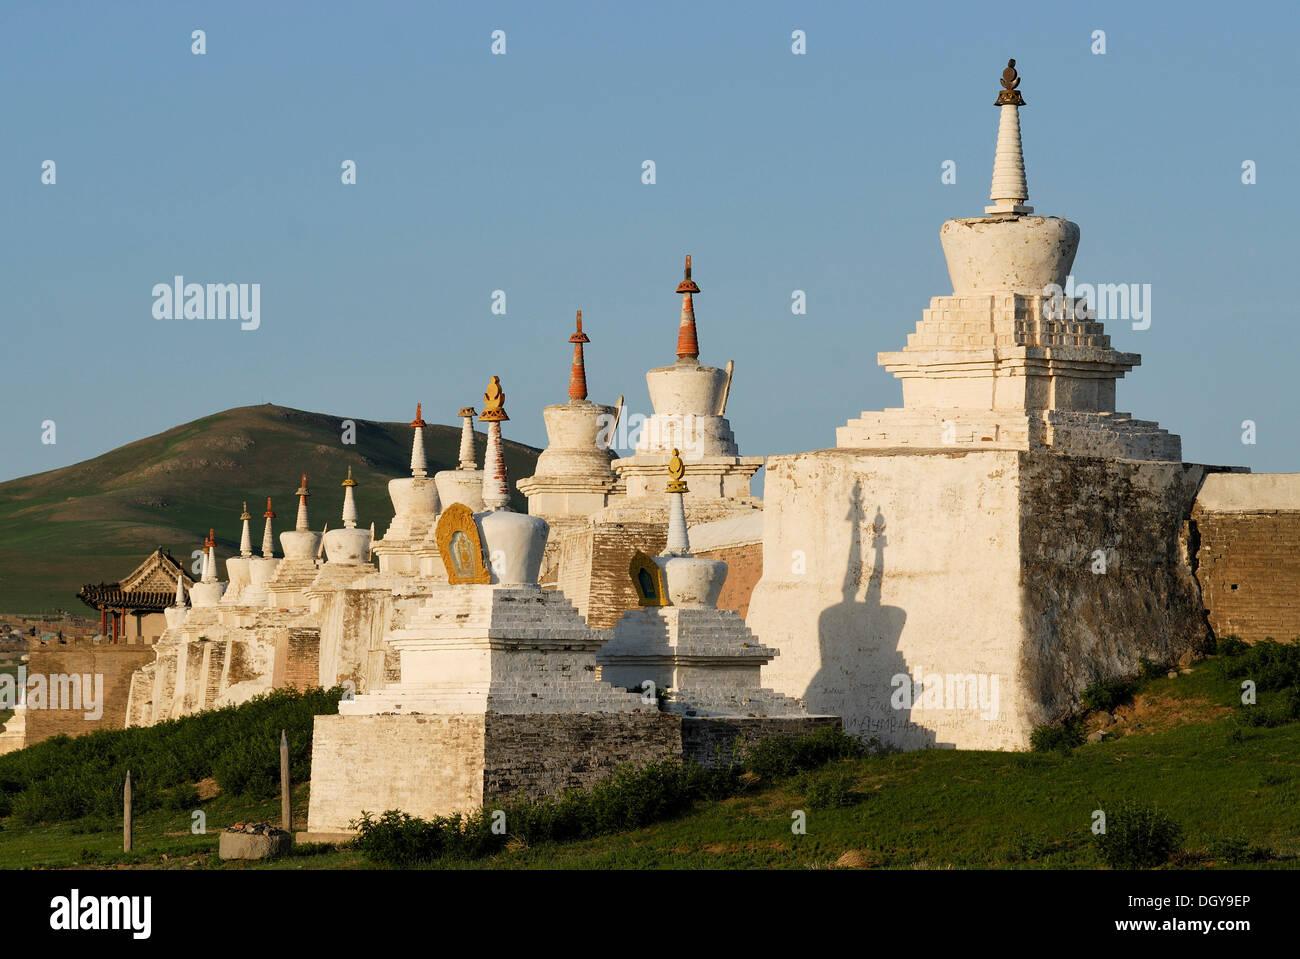 Stupa and gatehouse of the outer wall of the Erdene Zuu Khiid Monastery, Karakorum, Kharkhorin, Oevoerkhangai province, Mongolia - Stock Image